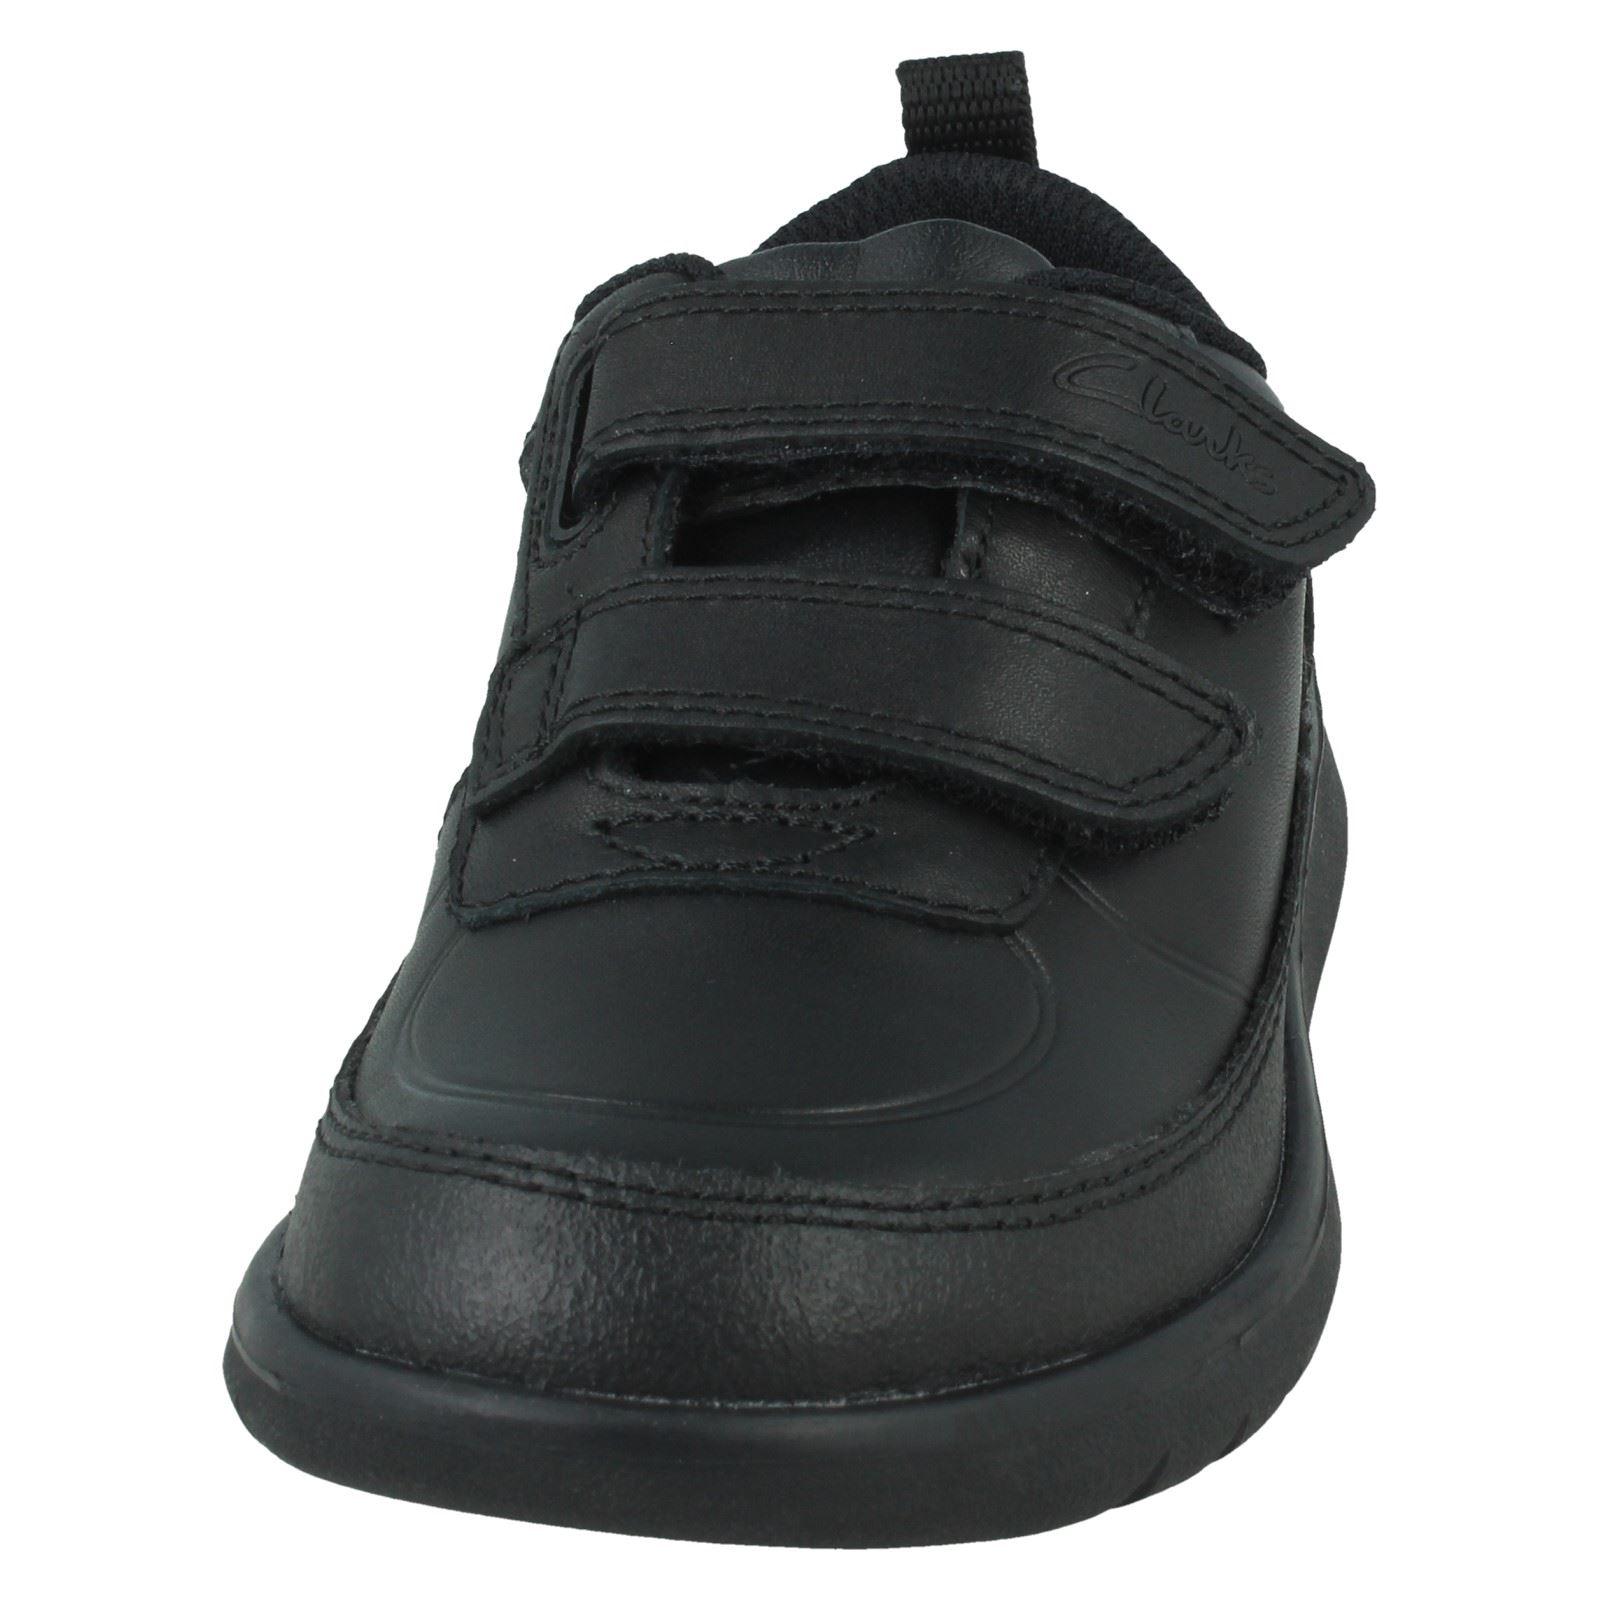 Clarks School Boys/' Scape Flare Kid Low-Top Sneakers